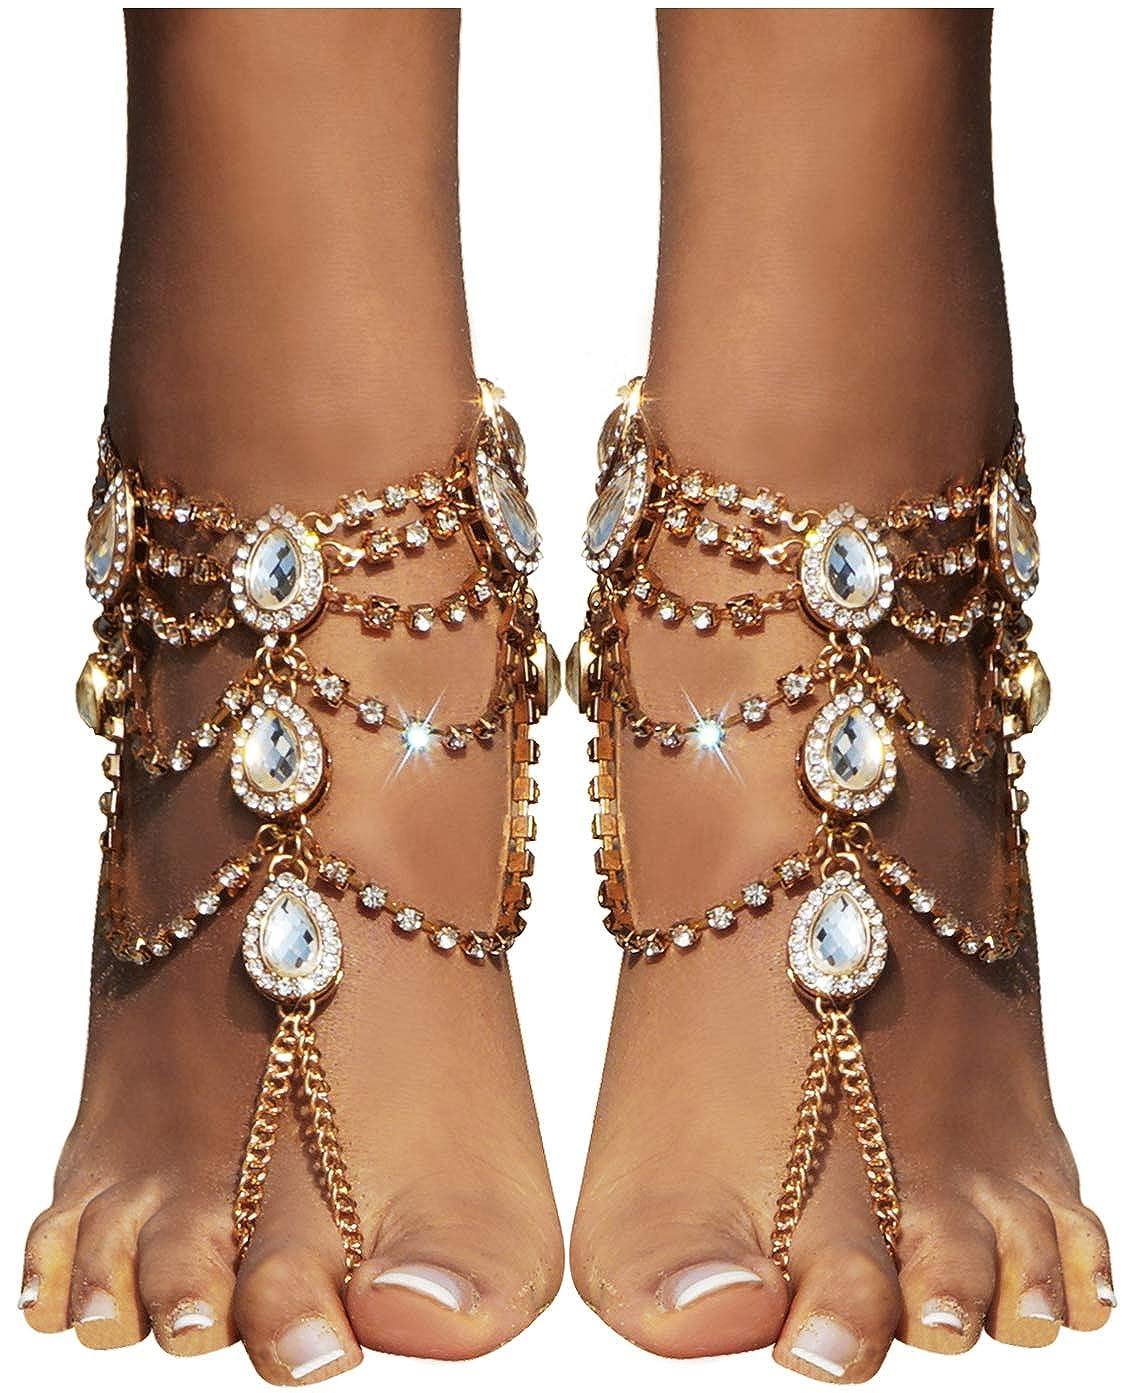 ebdd87c9752f Amazon.com  Bienvenu 2 PCS Crystal Beach Wedding Foot Jewelry Barefoot  Sandals Toe Ring Boho Anklet with Multi Tassel